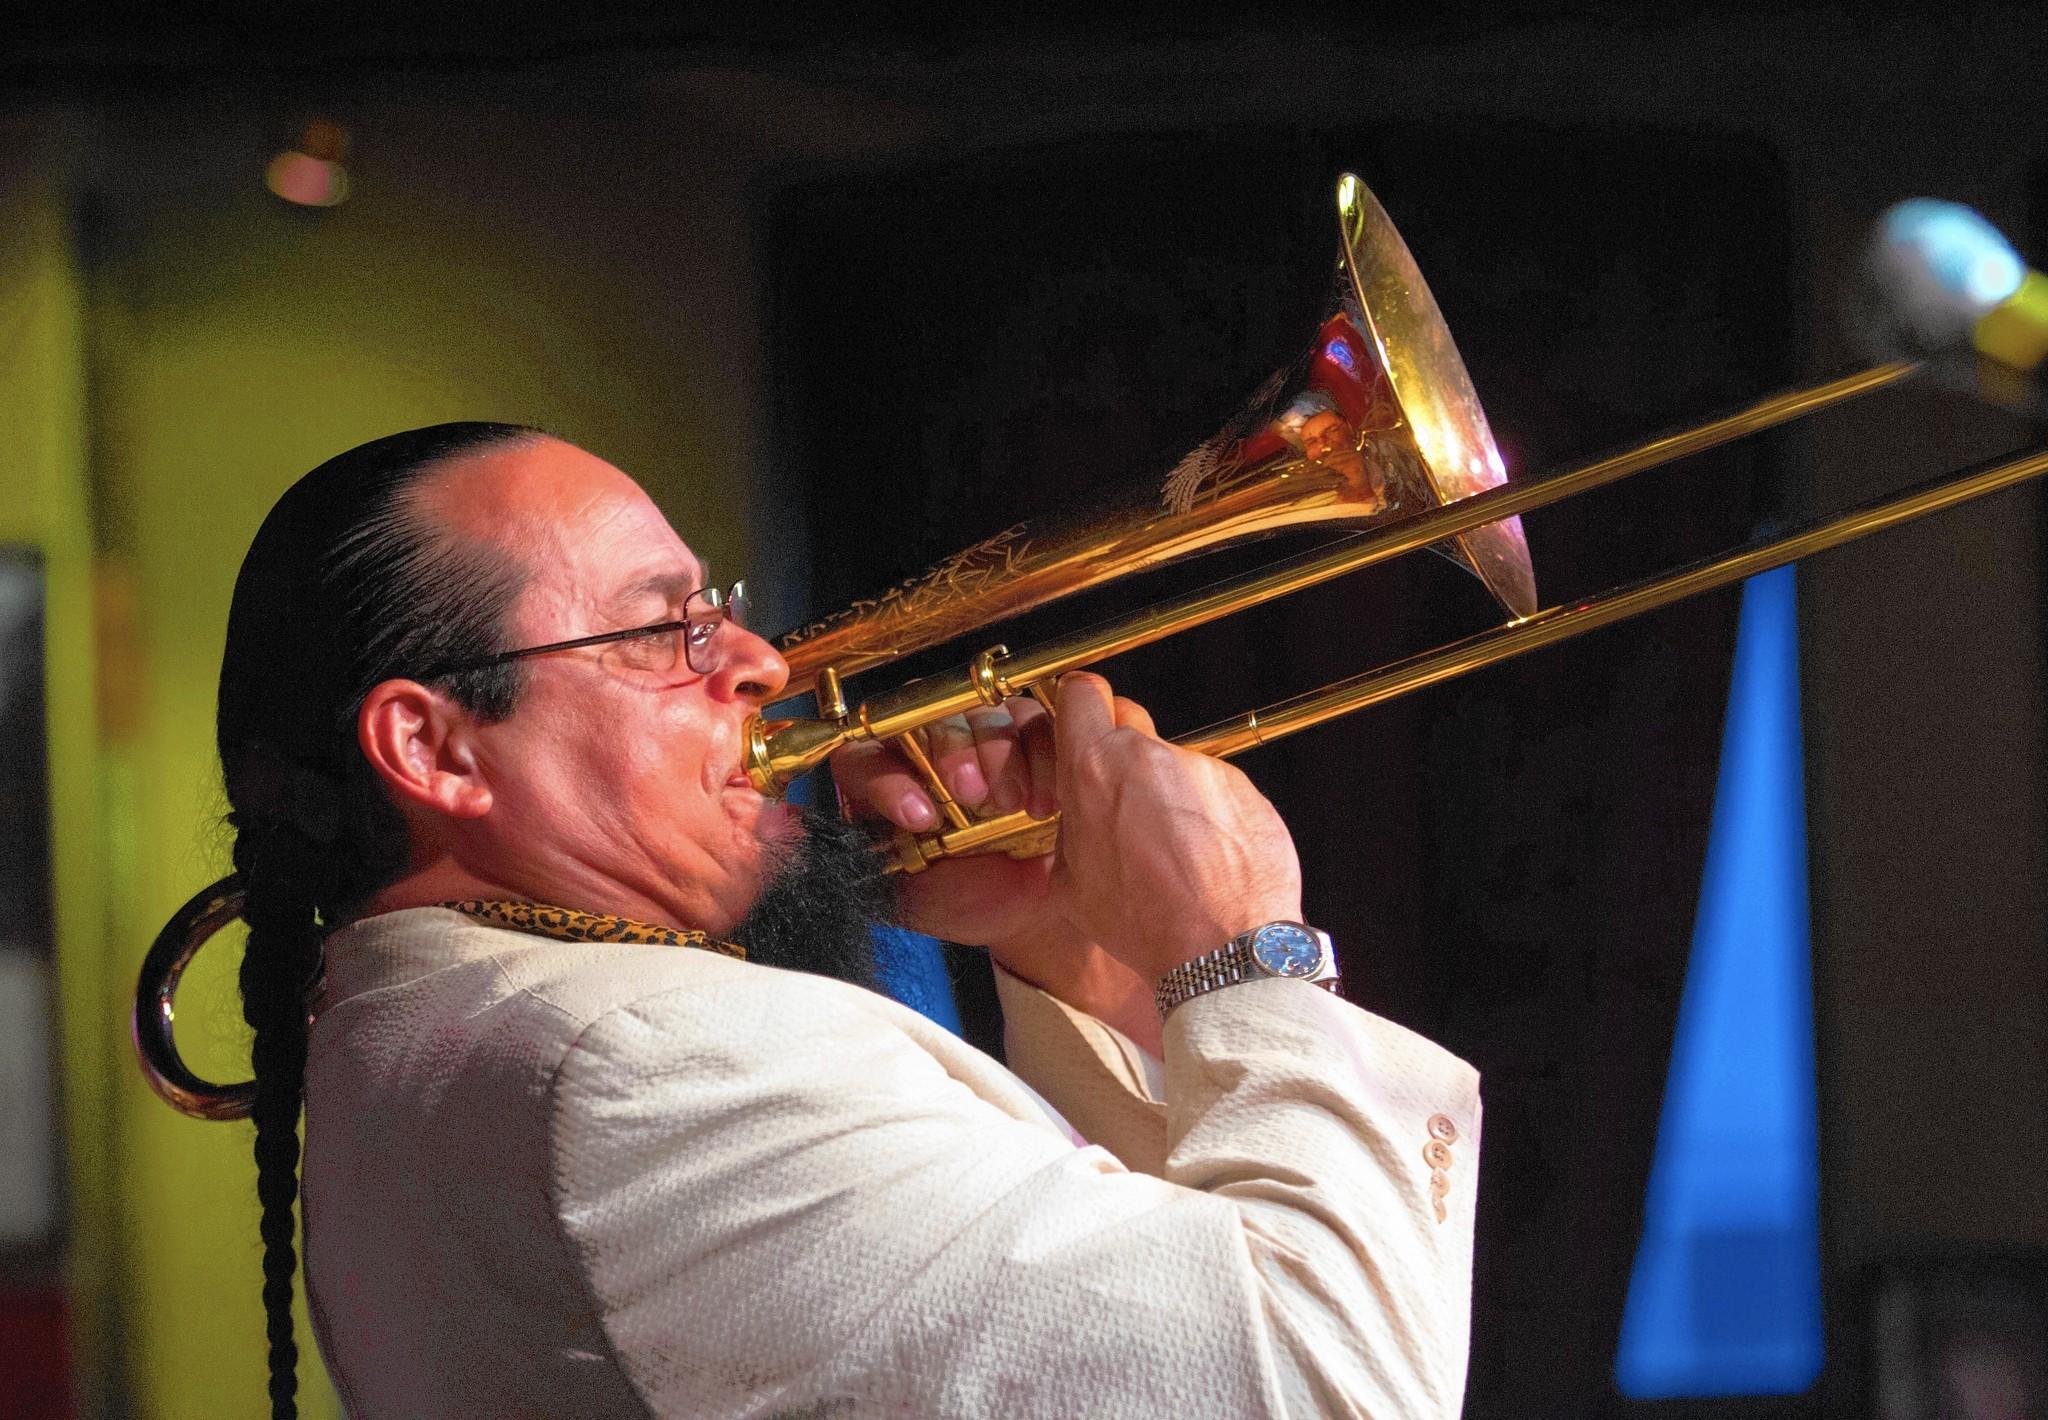 Trombonist Steve Turre shows mastery in many ways - Chicago Tribune